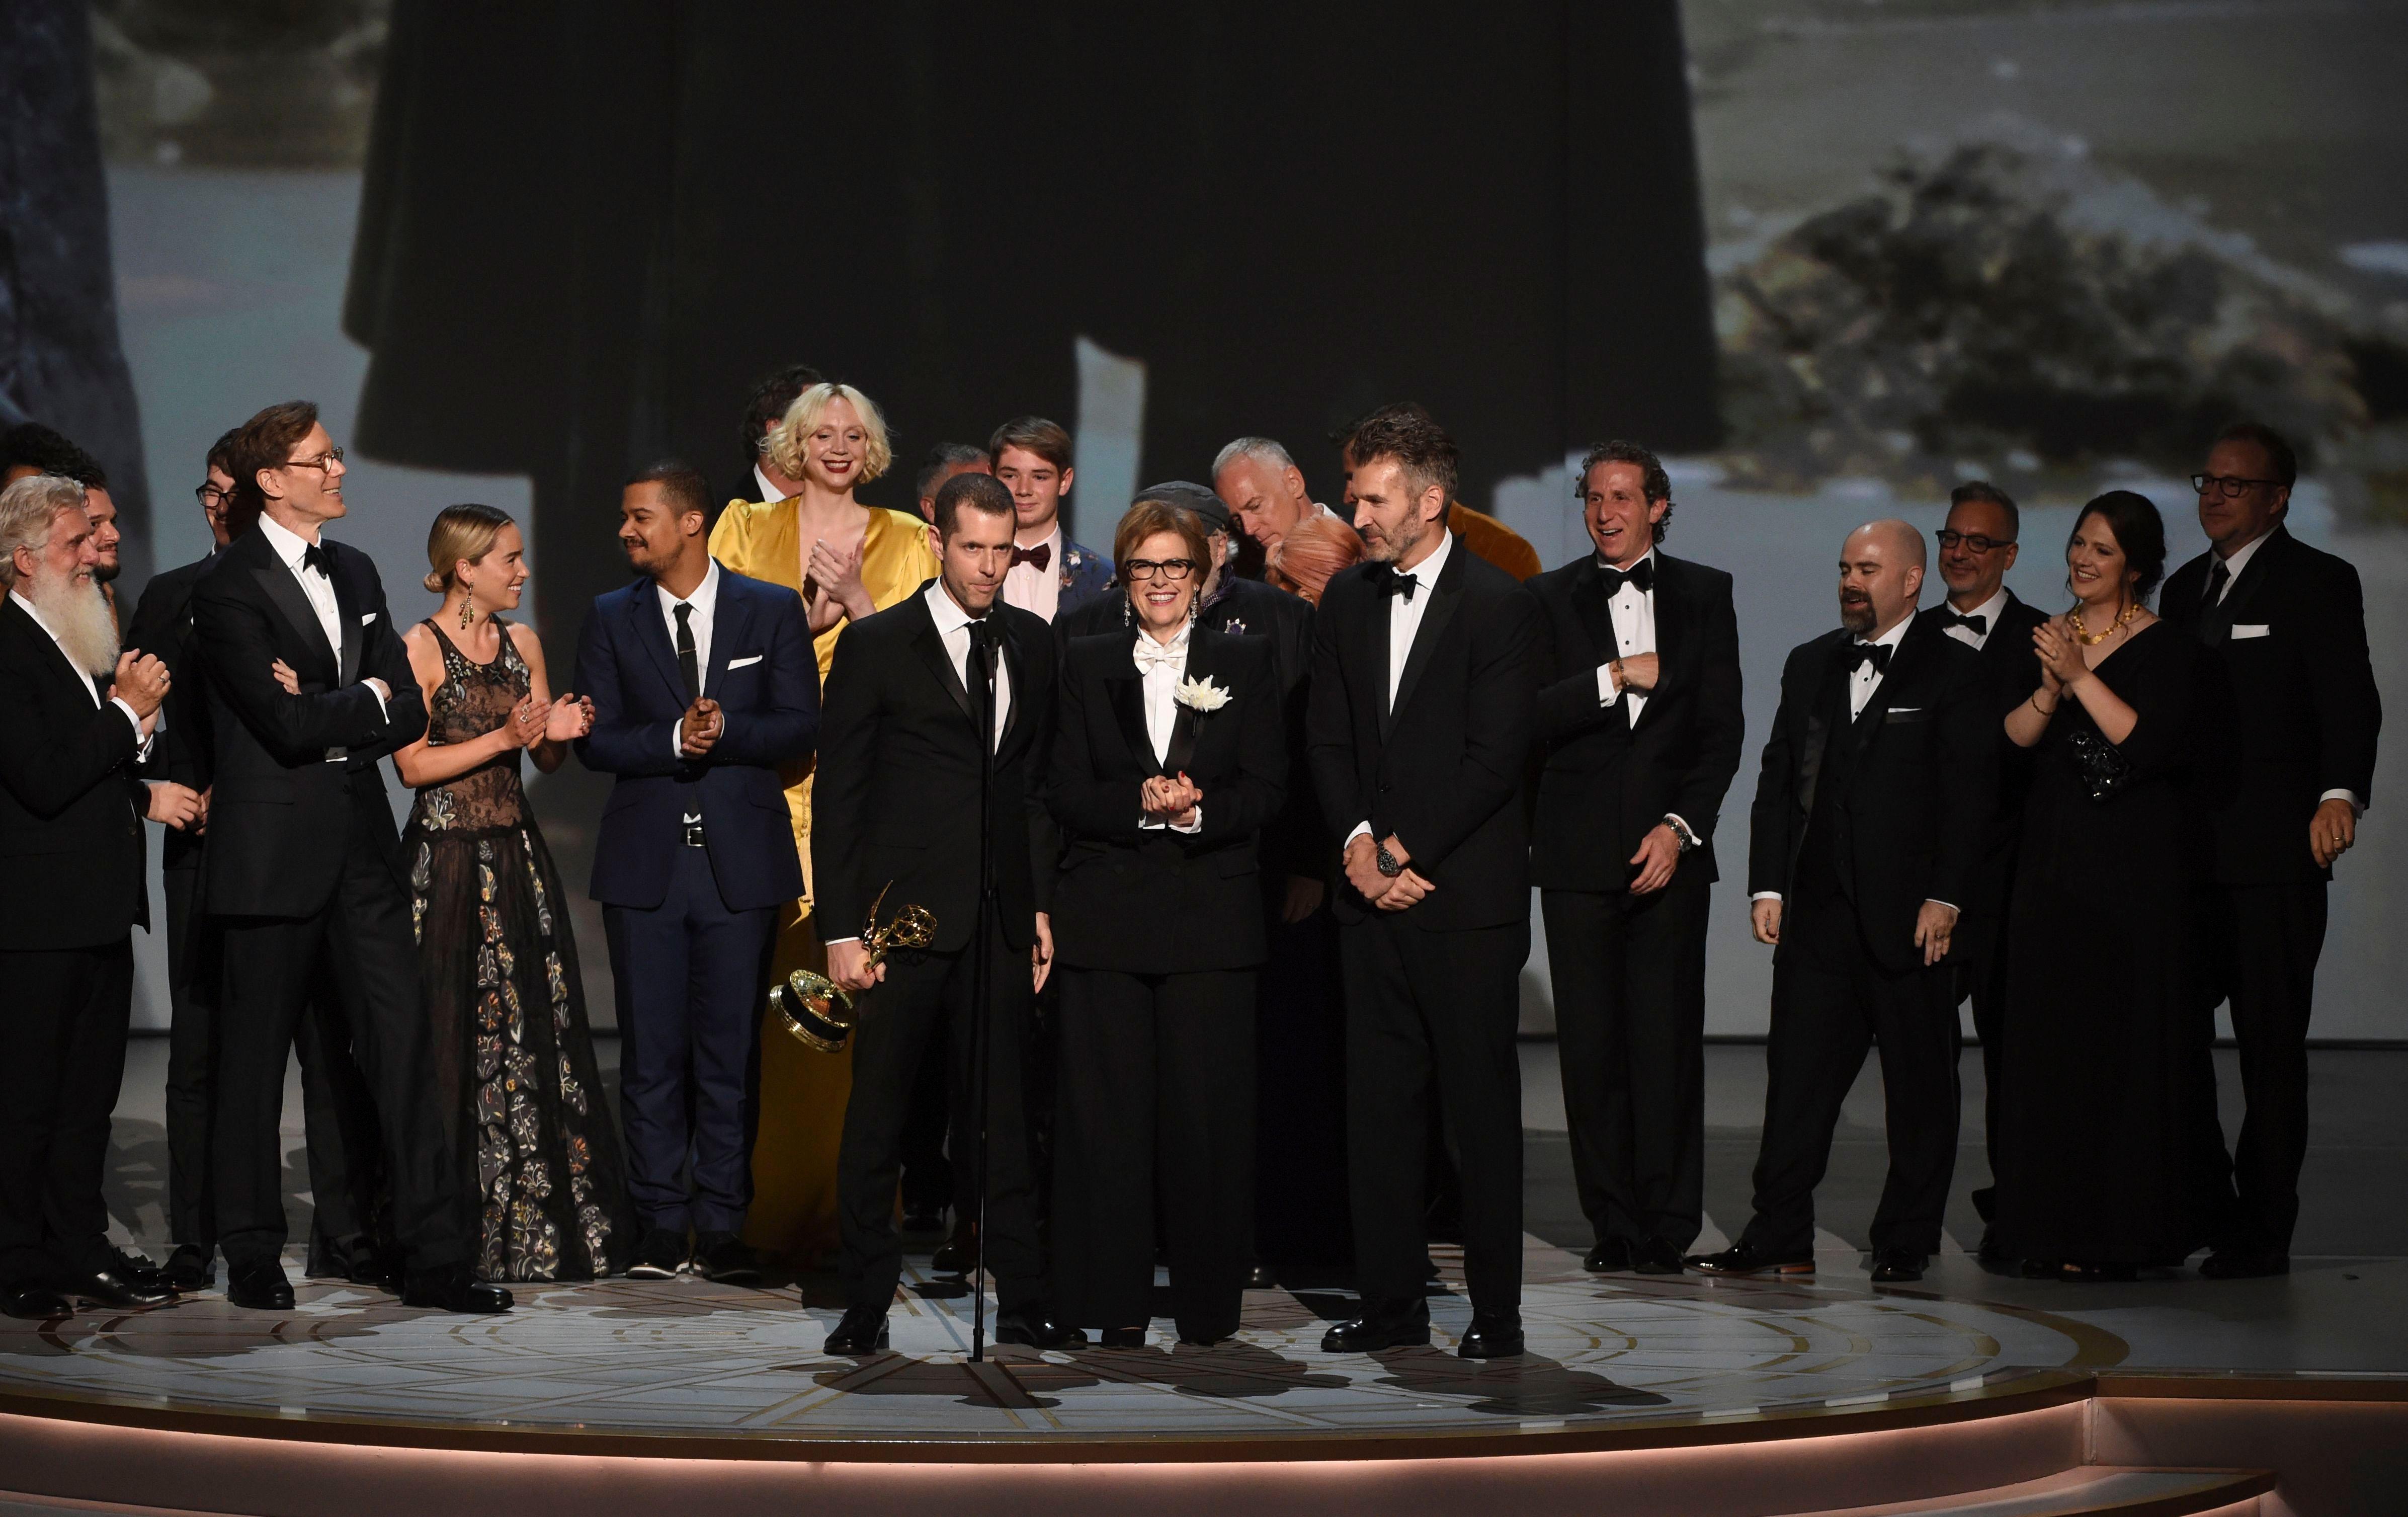 70th Primetime Emmy Awards - Show, Los Angeles, USA - 17 Sep 2018